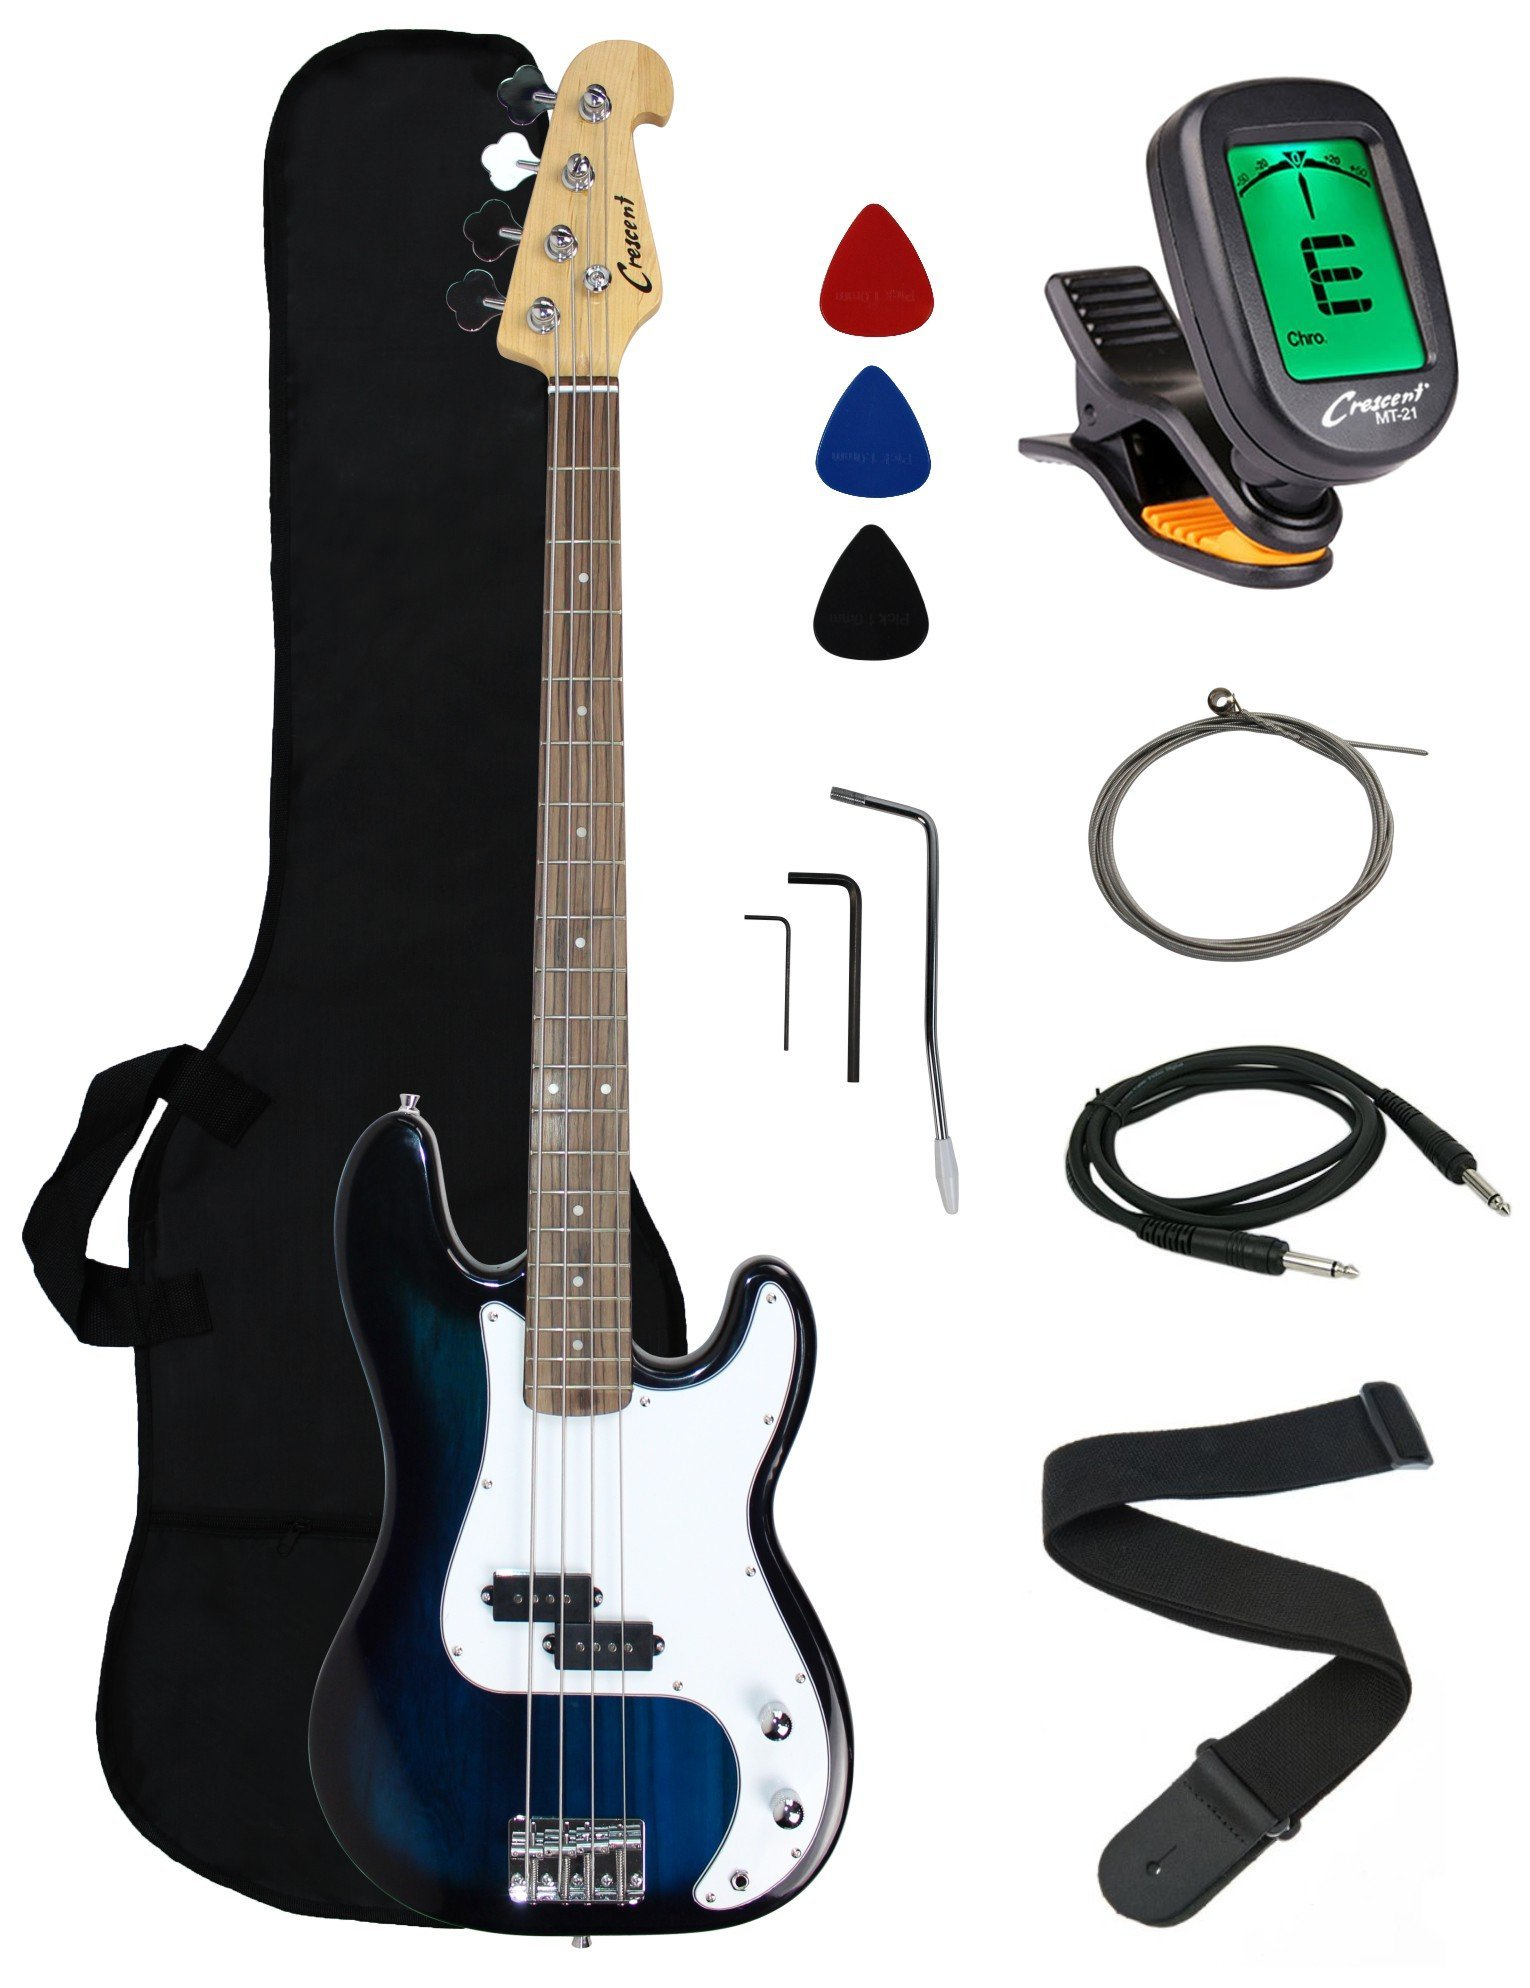 Crescent Electric Bass Guitar Starter Kit - Bluburst Color (Includes CrescentTM Digital E-Tuner)